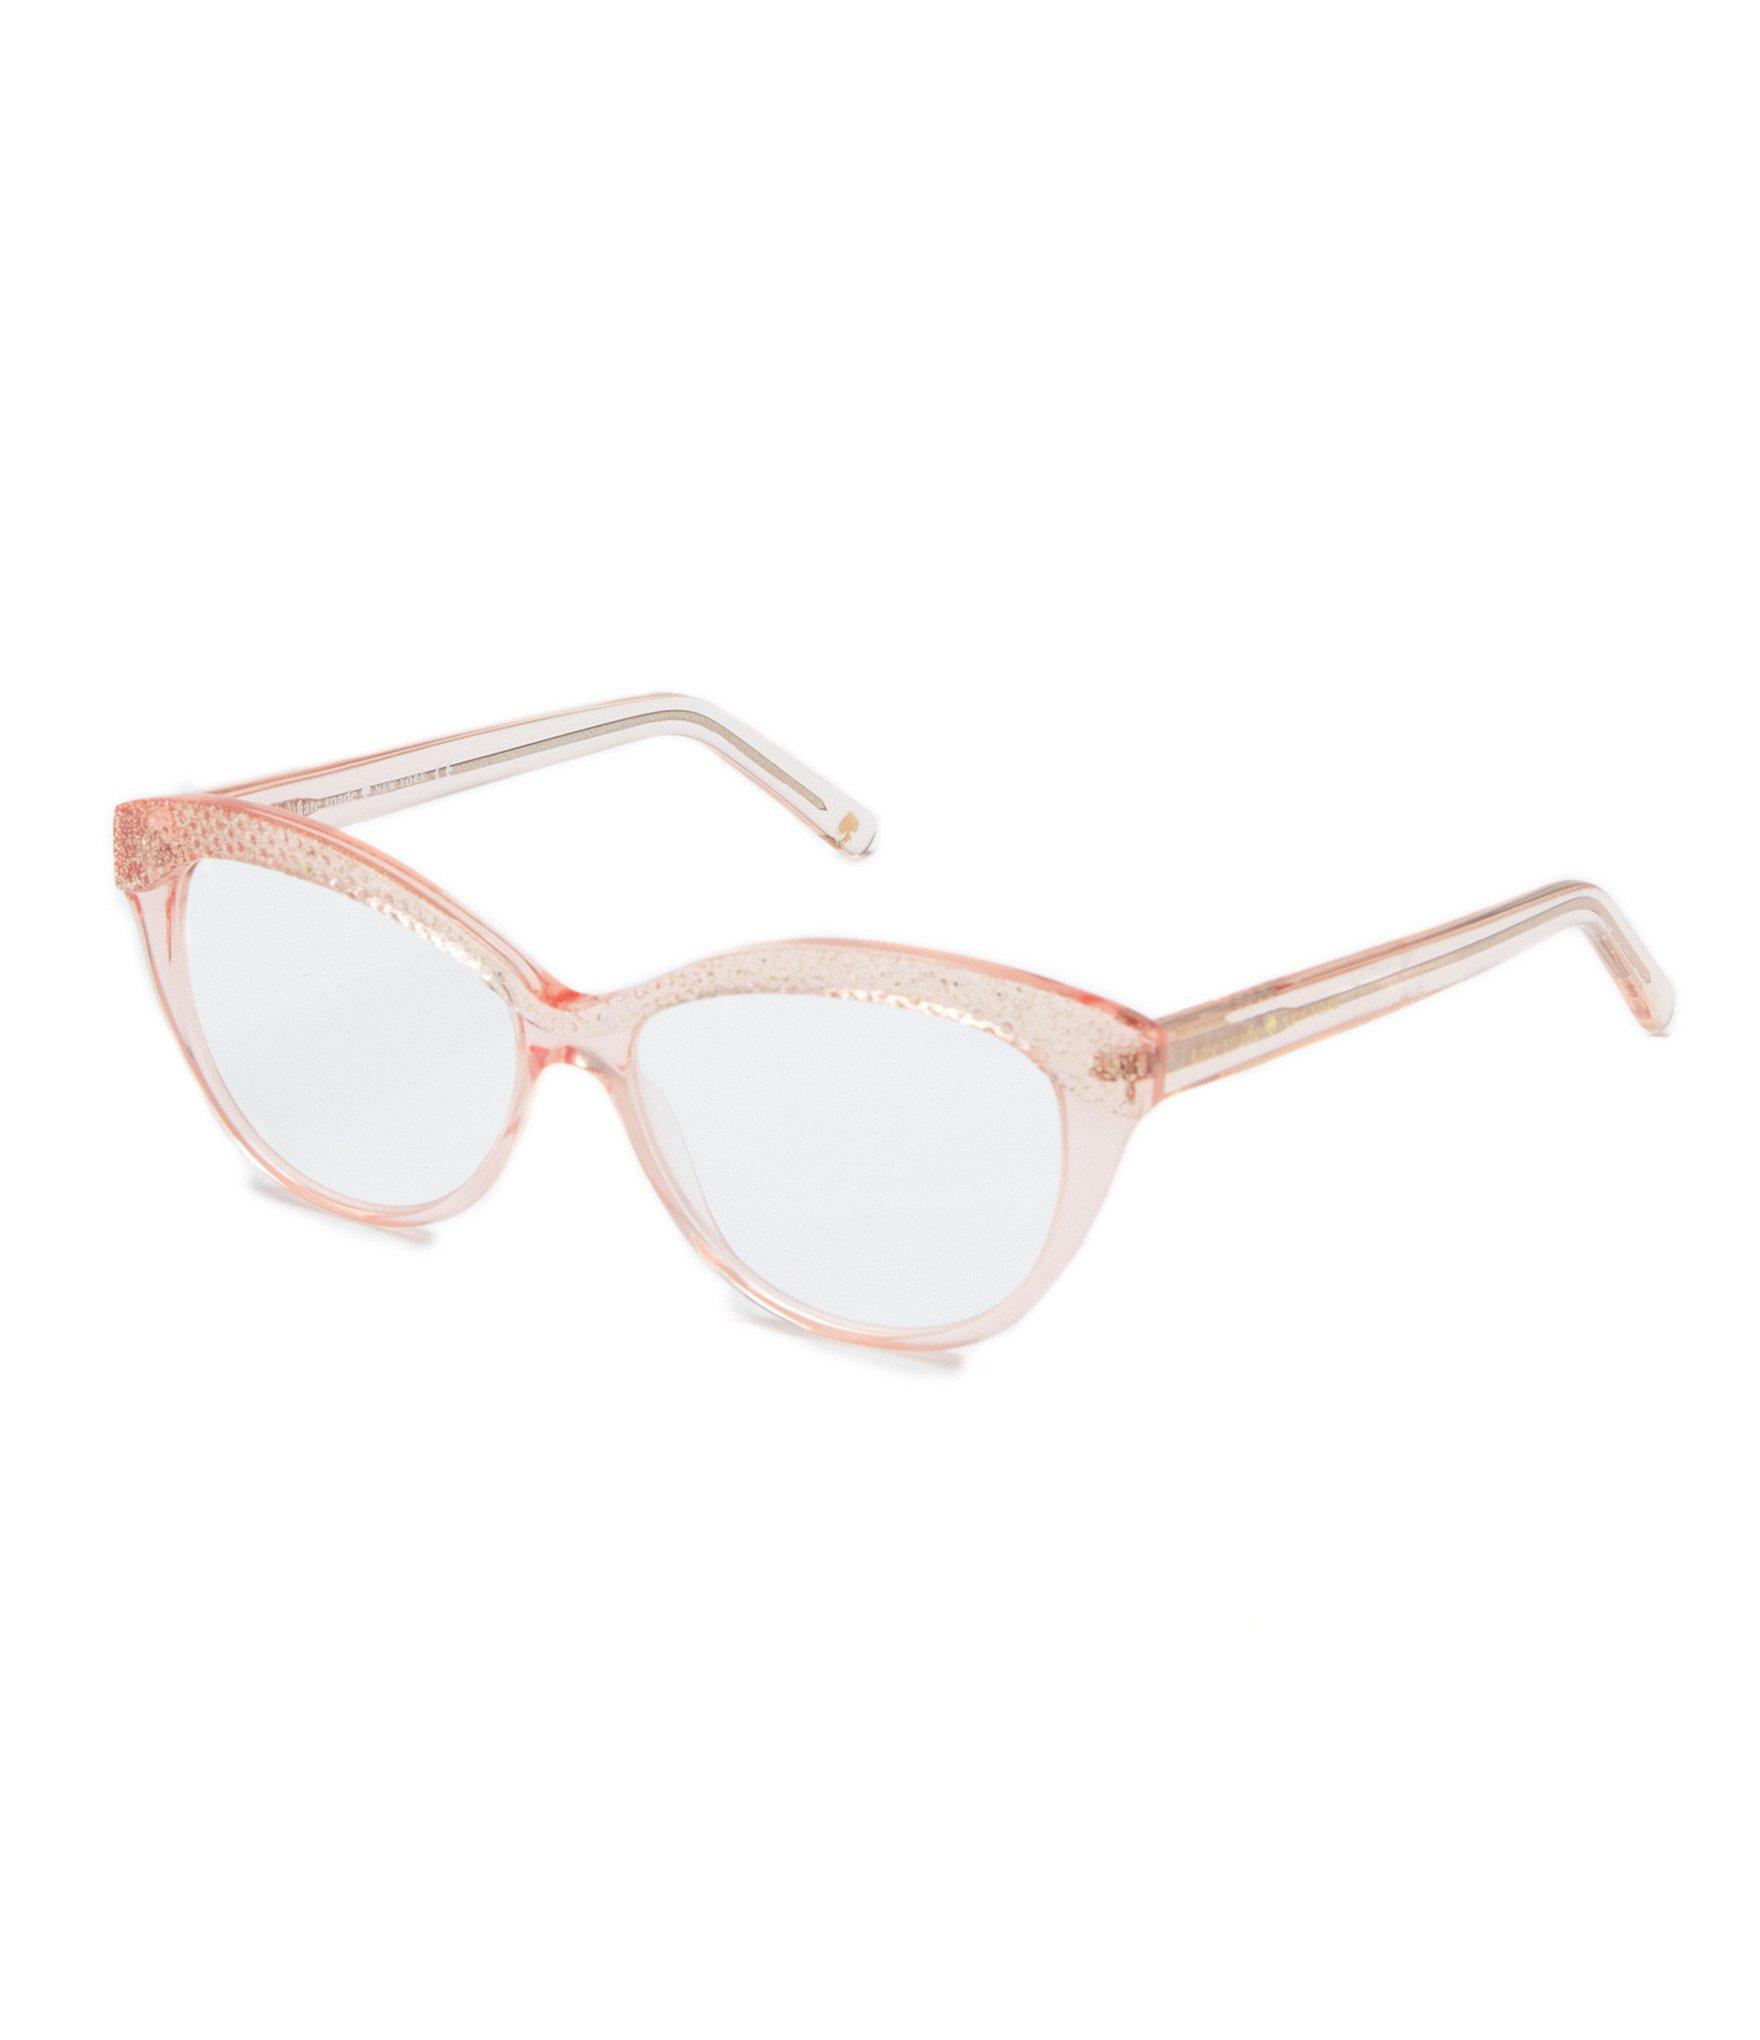 ac66630477c Lyst - Kate Spade Zabrina Cat-eye Reading Glasses in Pink